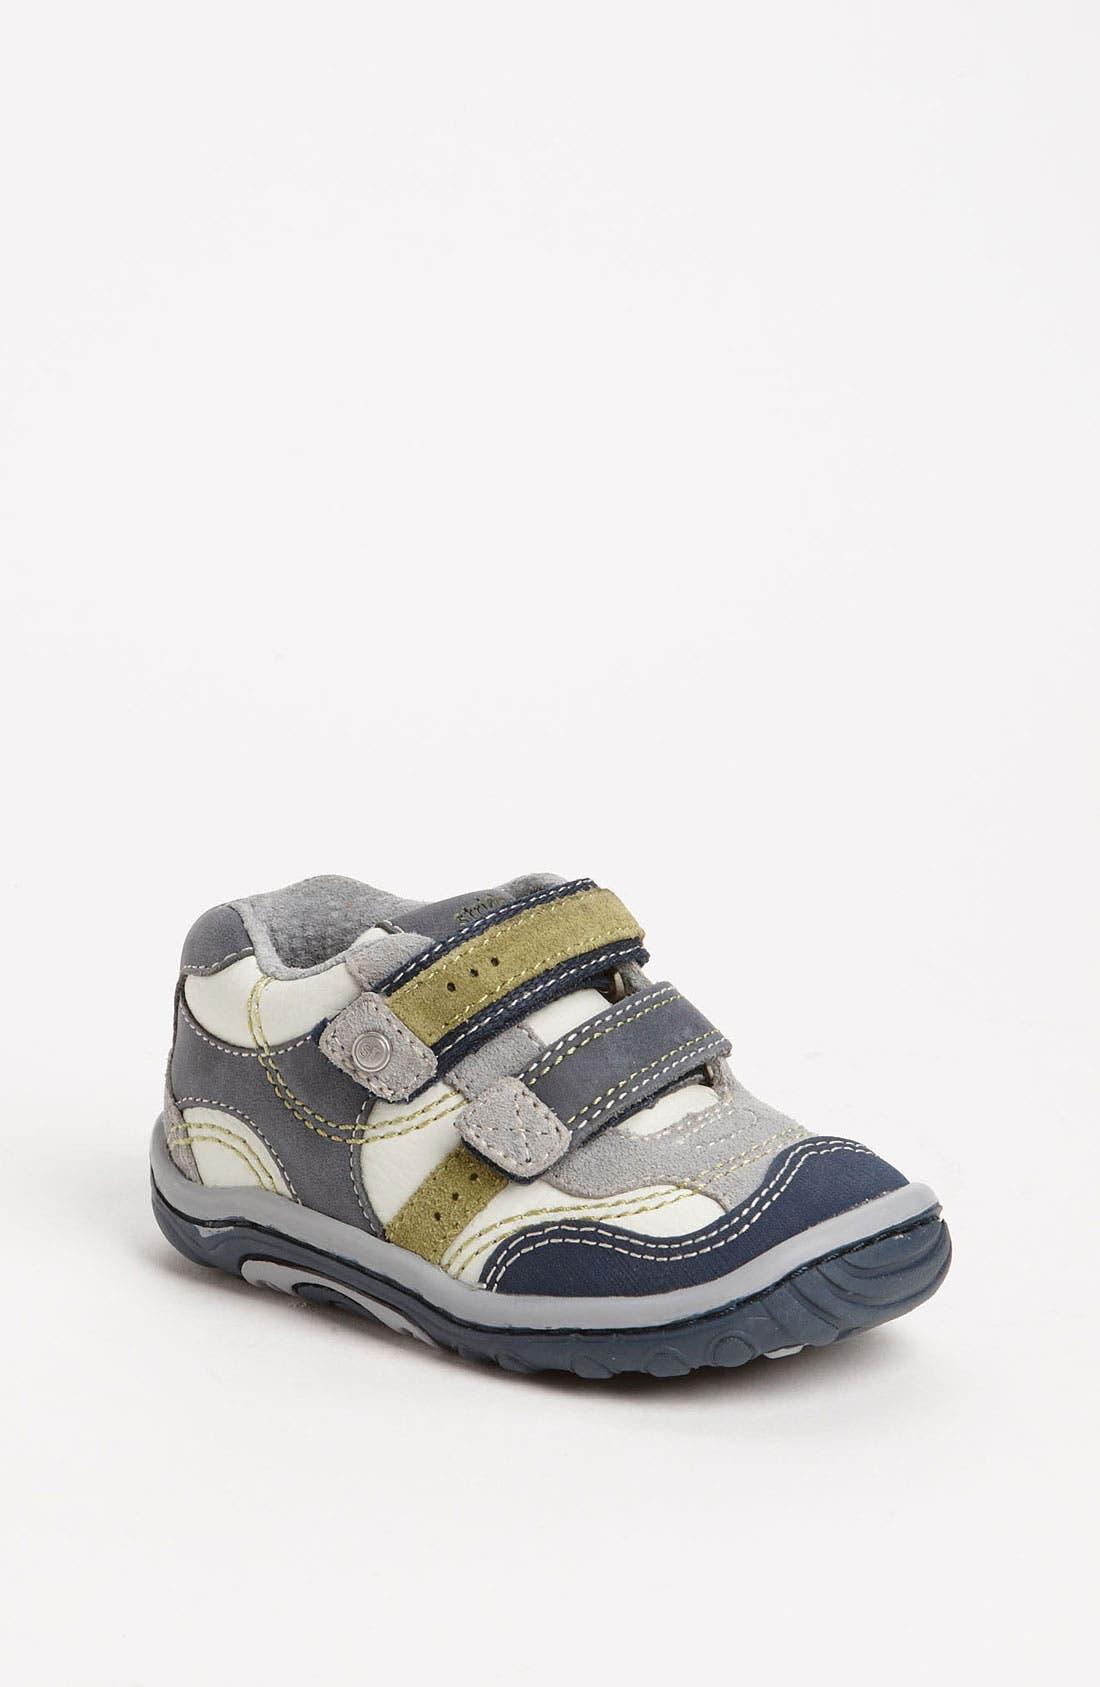 Alternate Image 1 Selected - Stride Rite 'Will' Sneaker (Baby, Walker & Toddler)